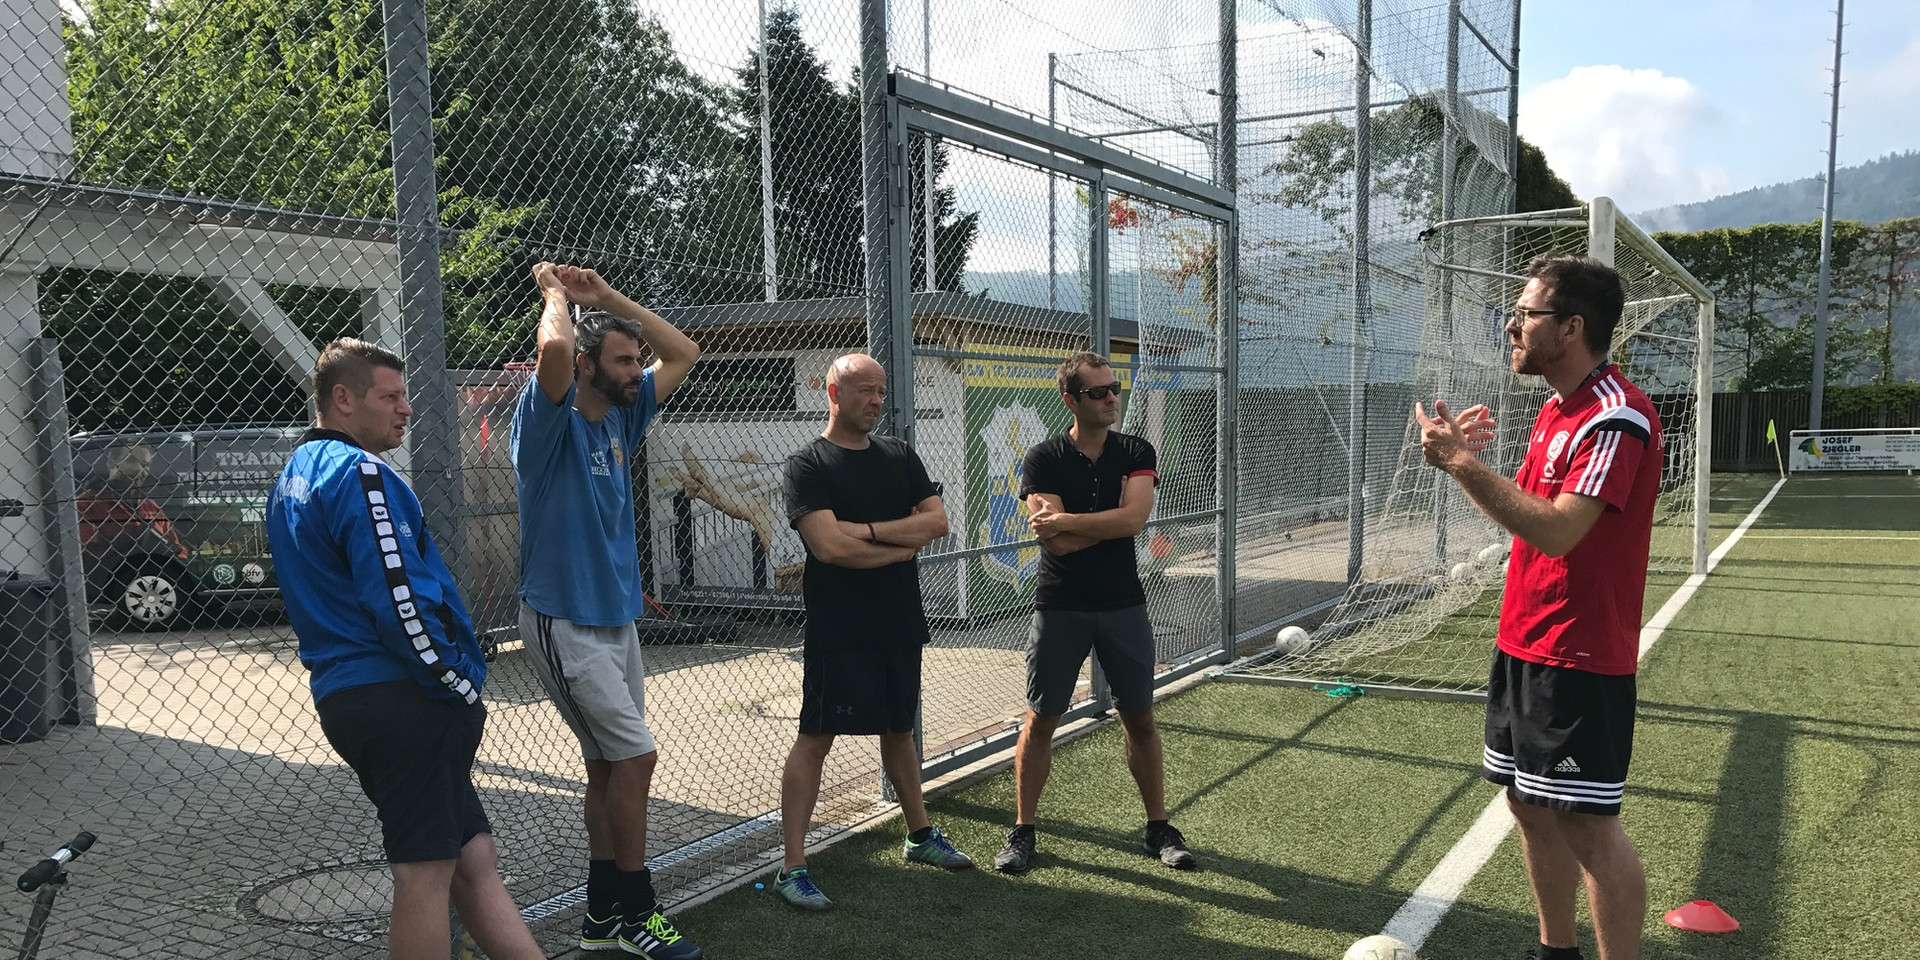 Trainerbesprechung